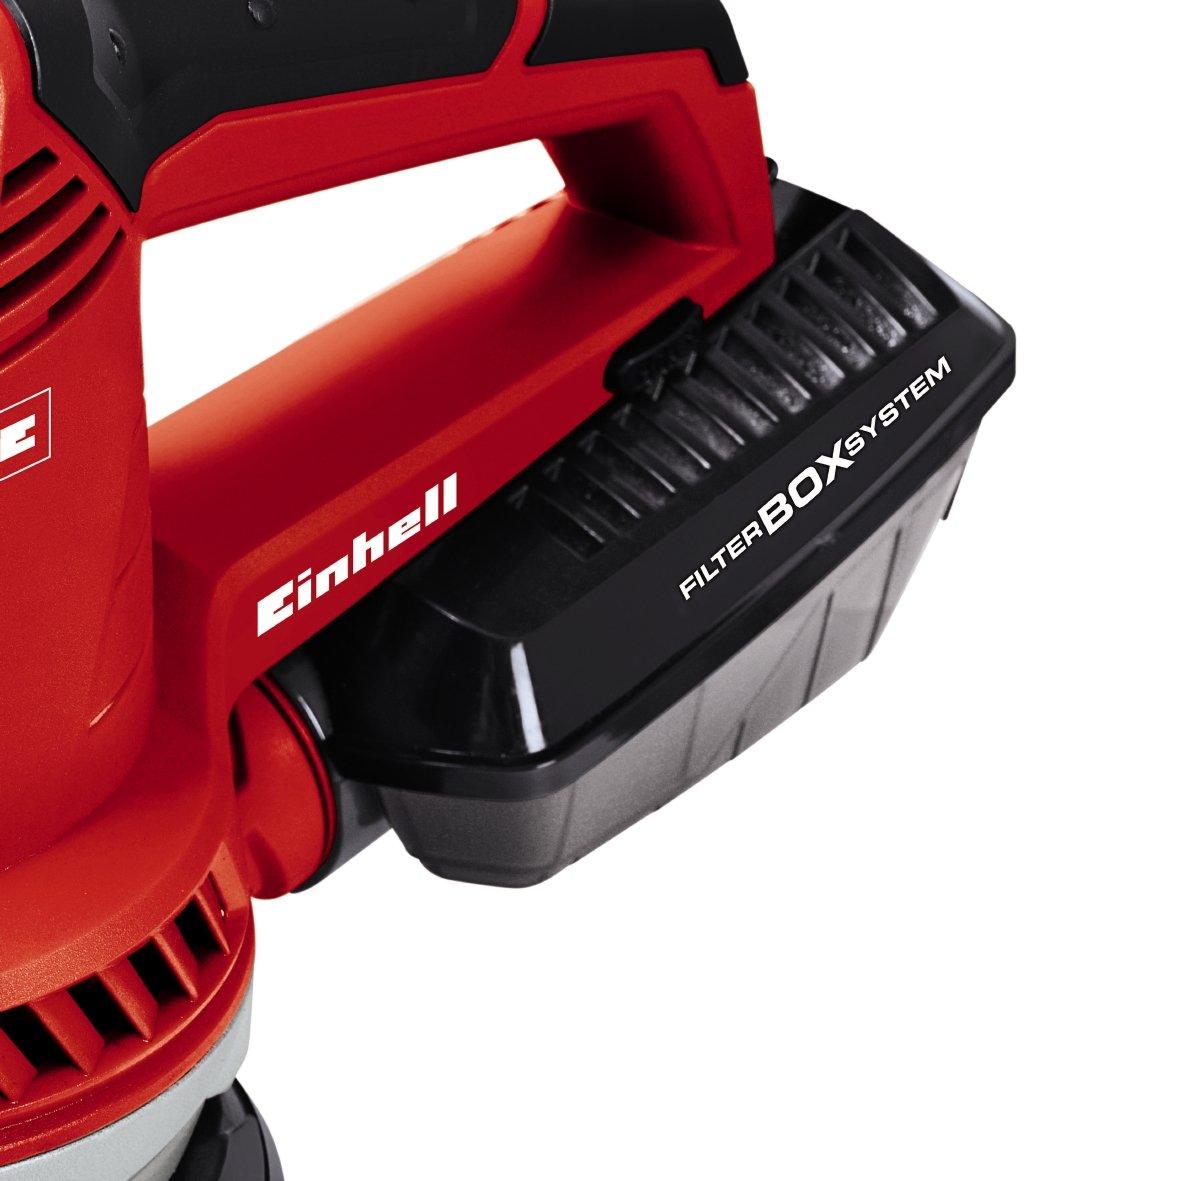 Einhell 4462000 LIJADORA EXCENTRICA Electronica TE-RS 40 E (Incluye maletin BMC), 400 W, 230 V: Amazon.es: Bricolaje y herramientas